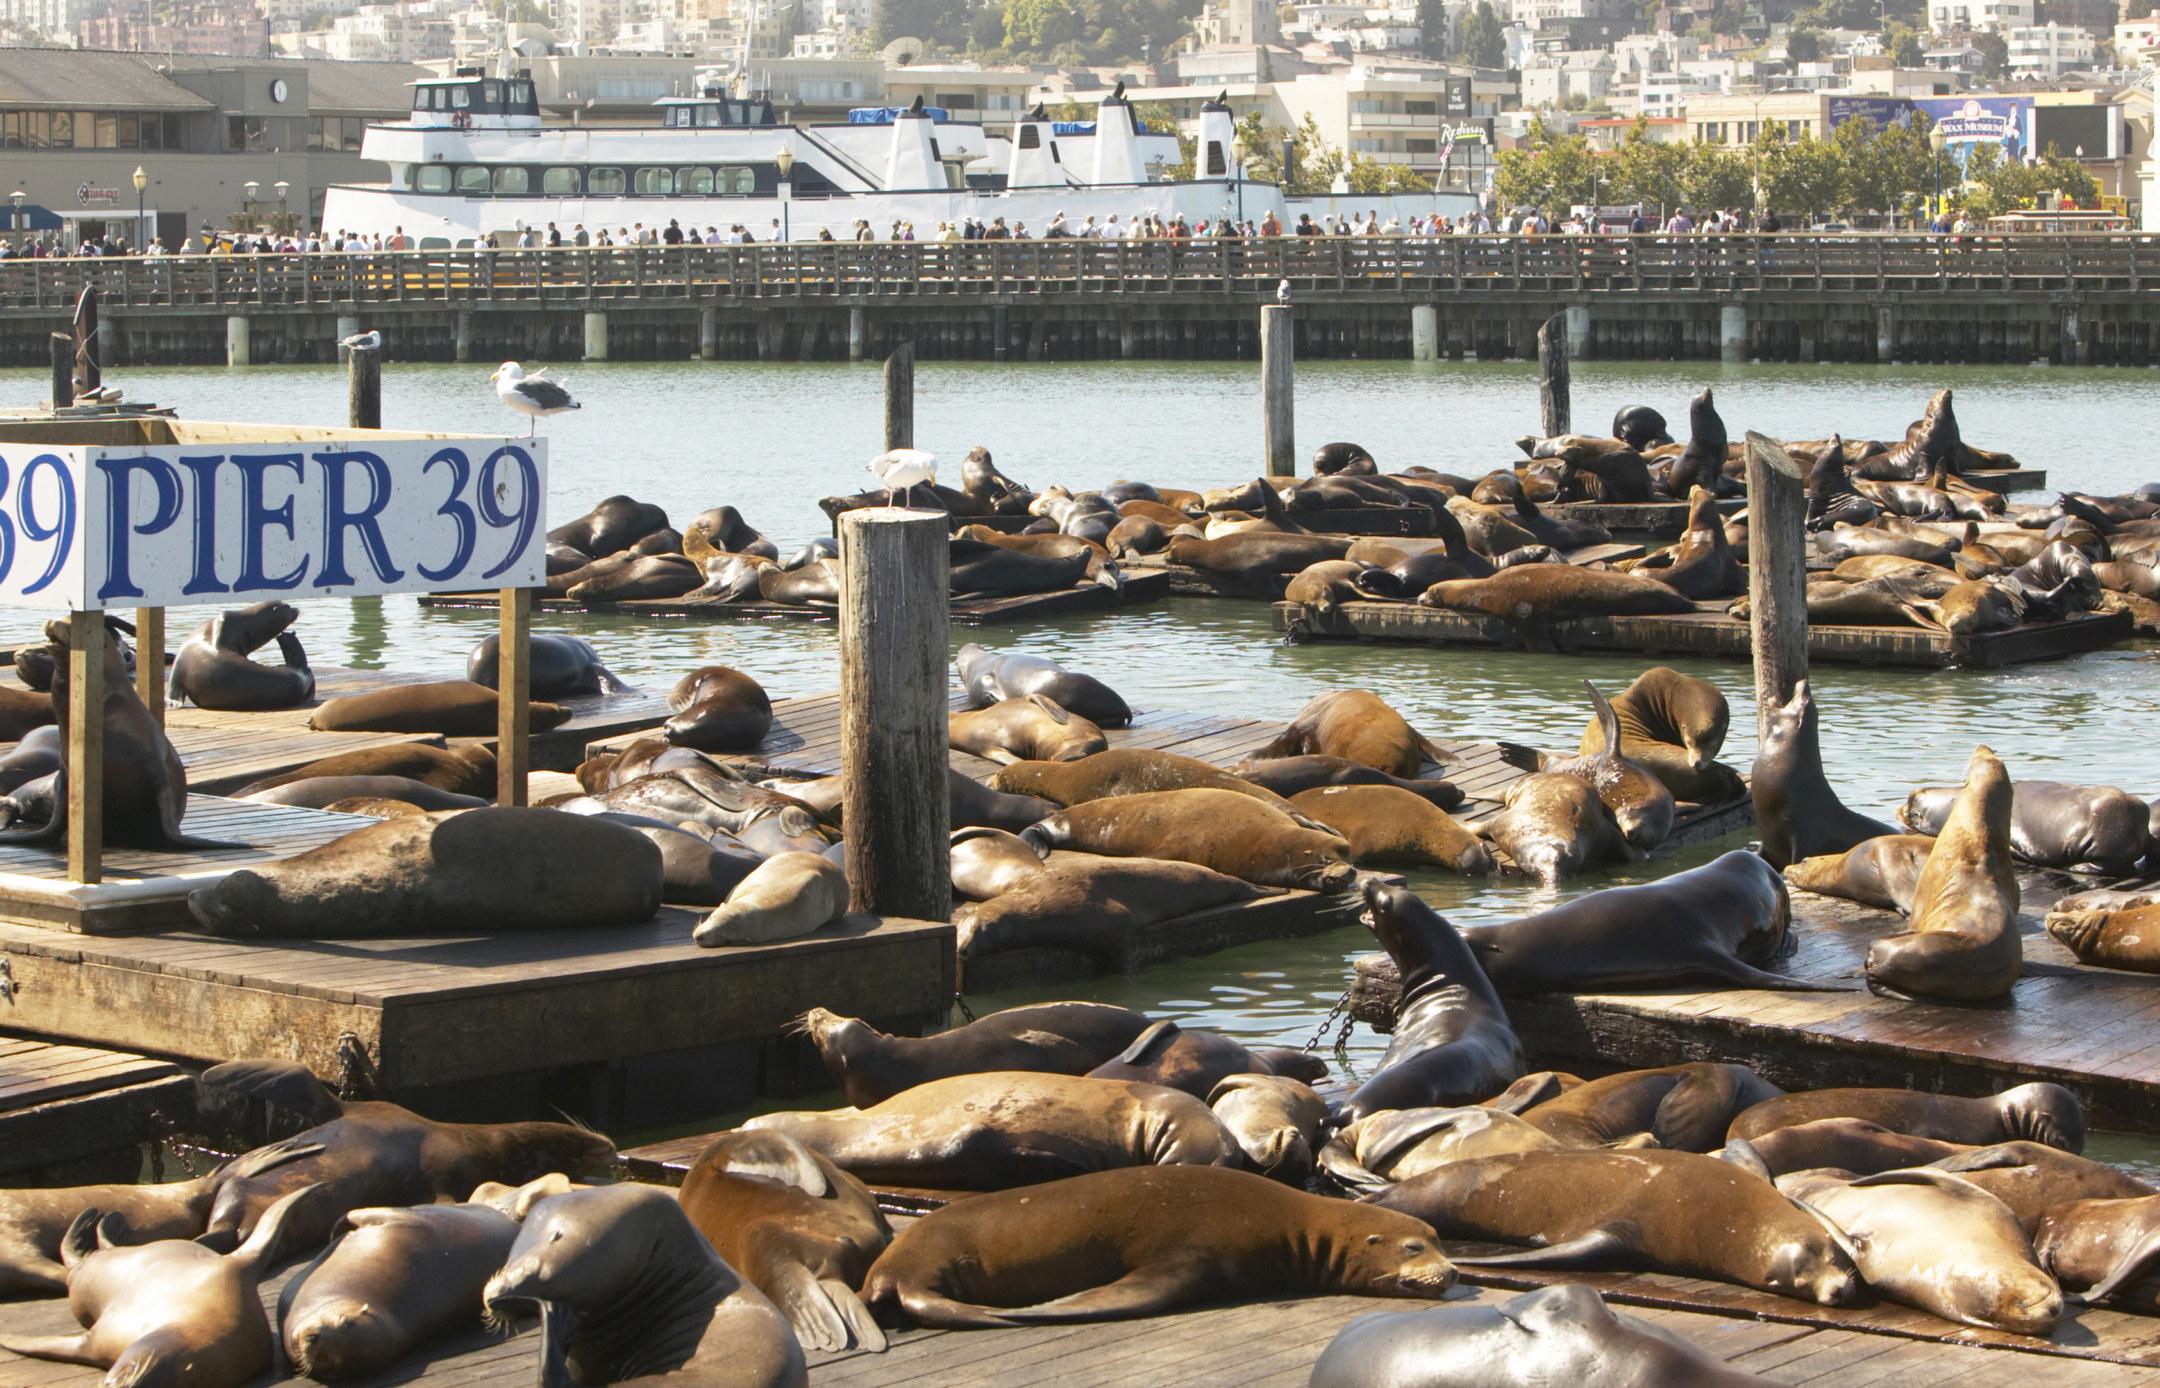 Sea lions at Pier 39 in San Francisco.